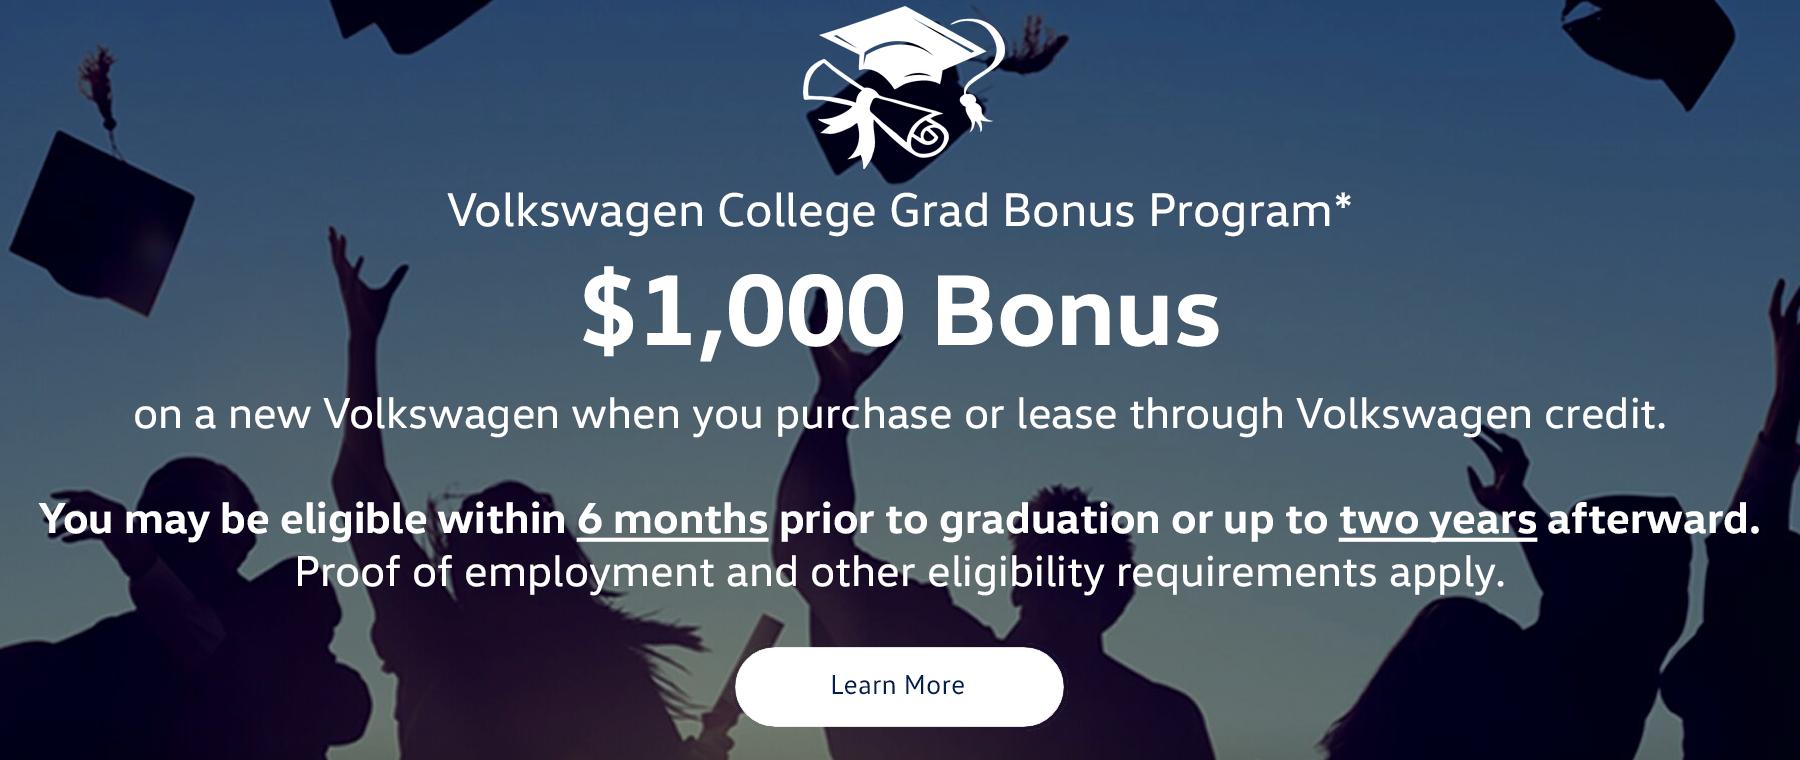 VW College Graduation Bonus - $1,000 at Kelly Volkswagen in Danvers MA